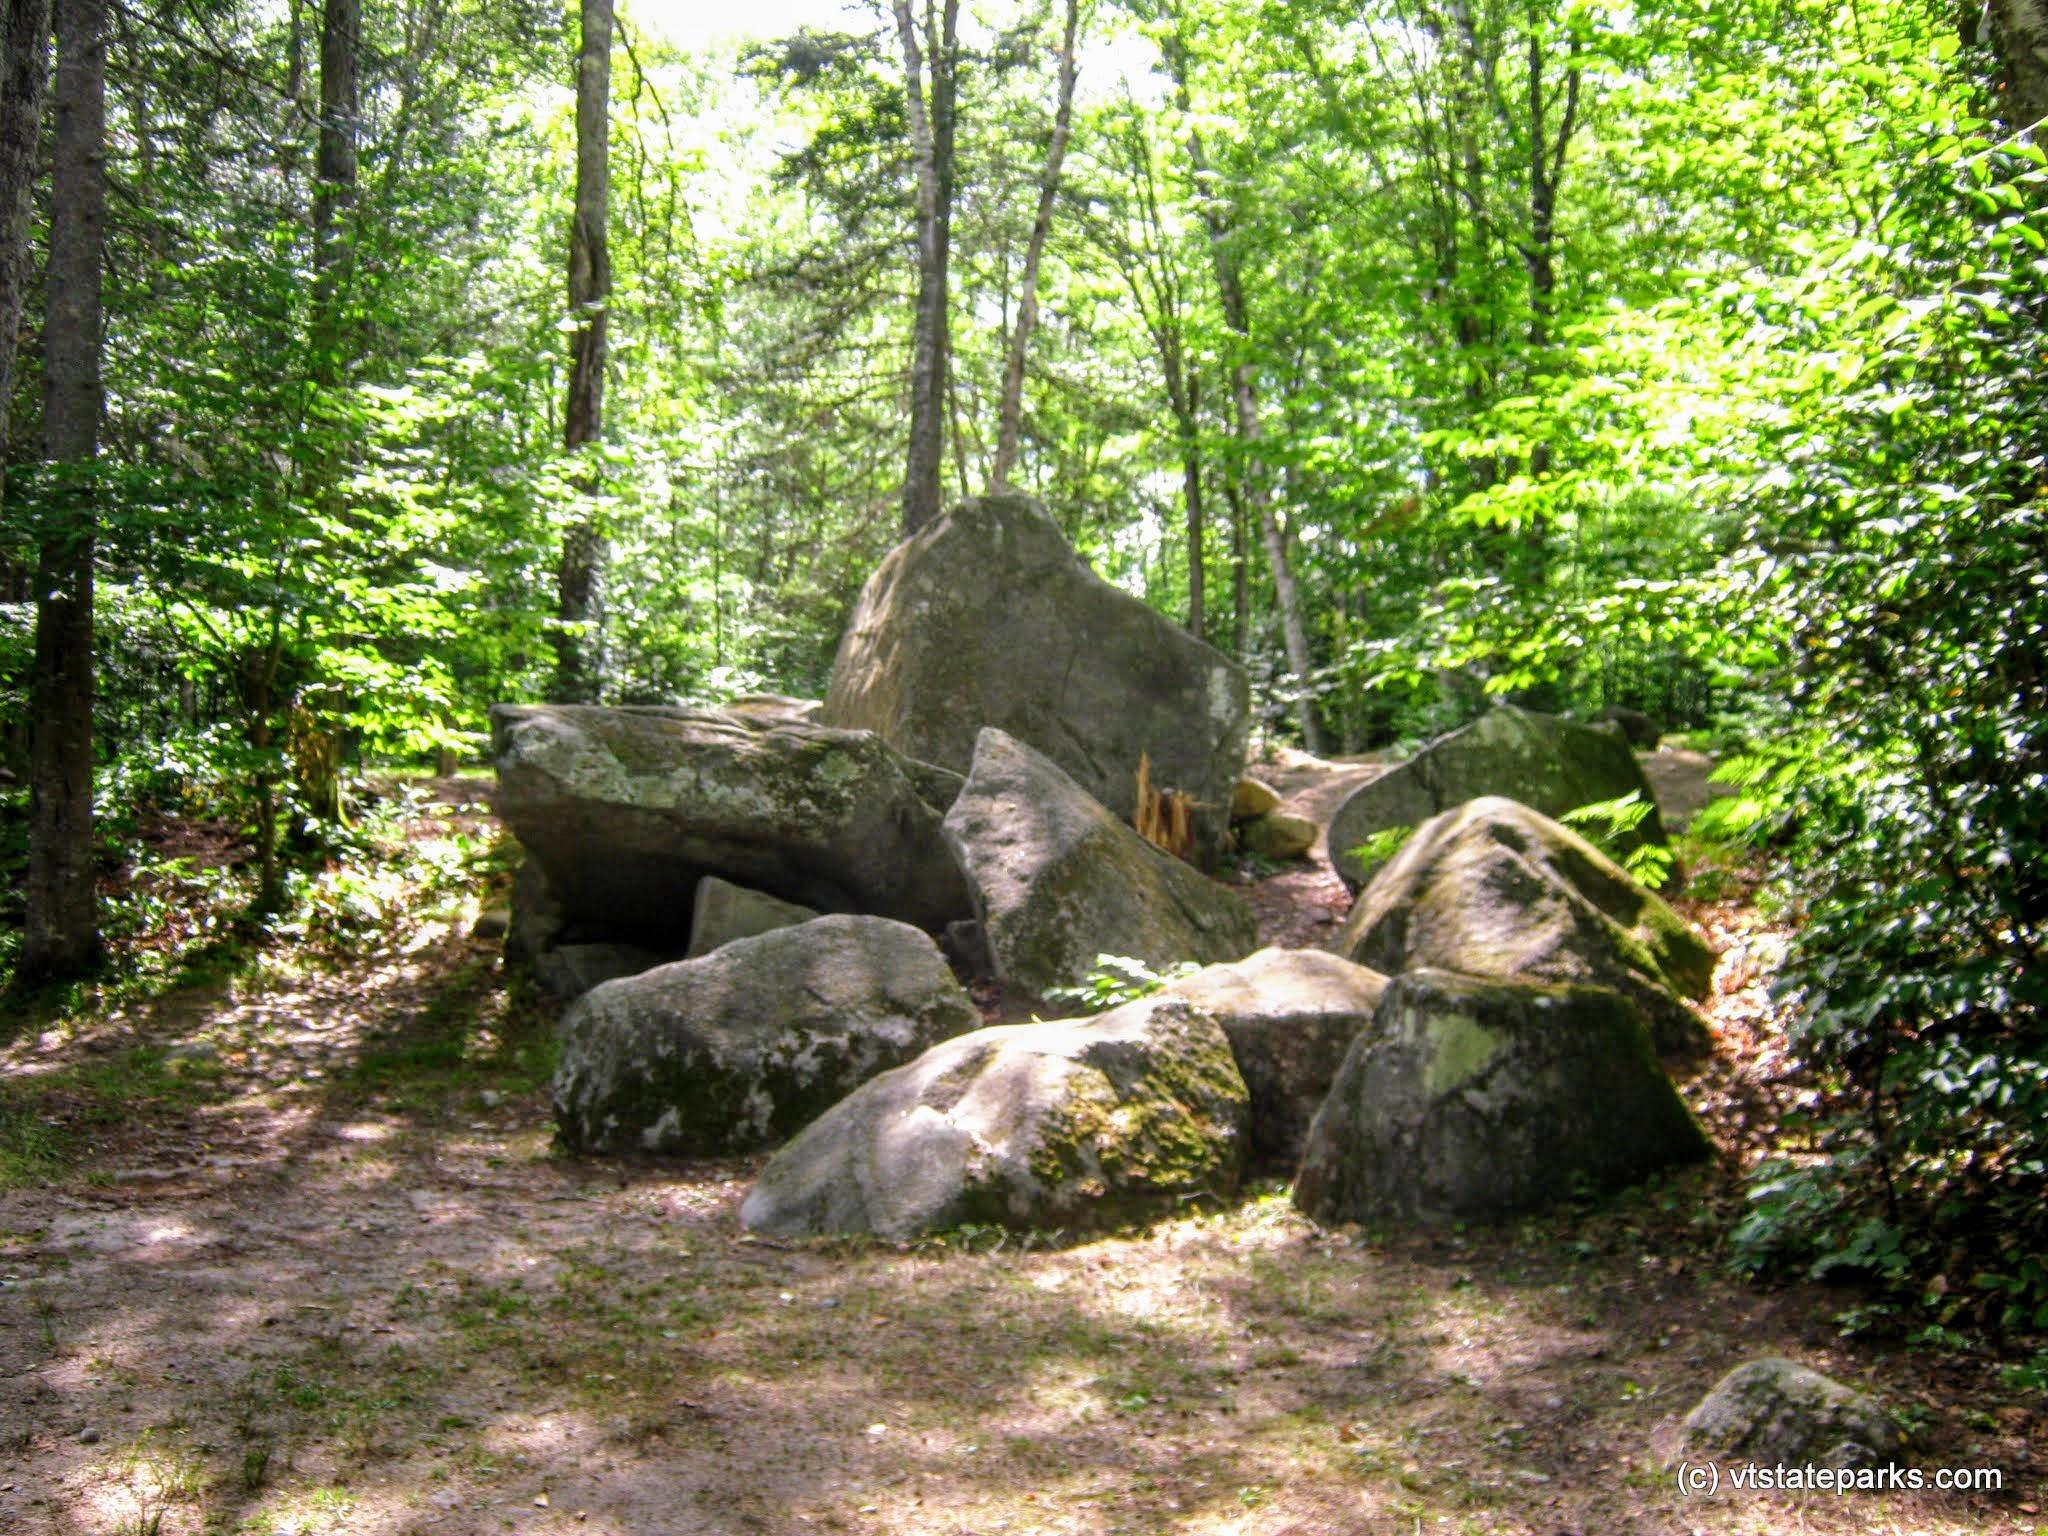 Photo: Tumbled boulders at Big Deer State Park by Matt Parsons